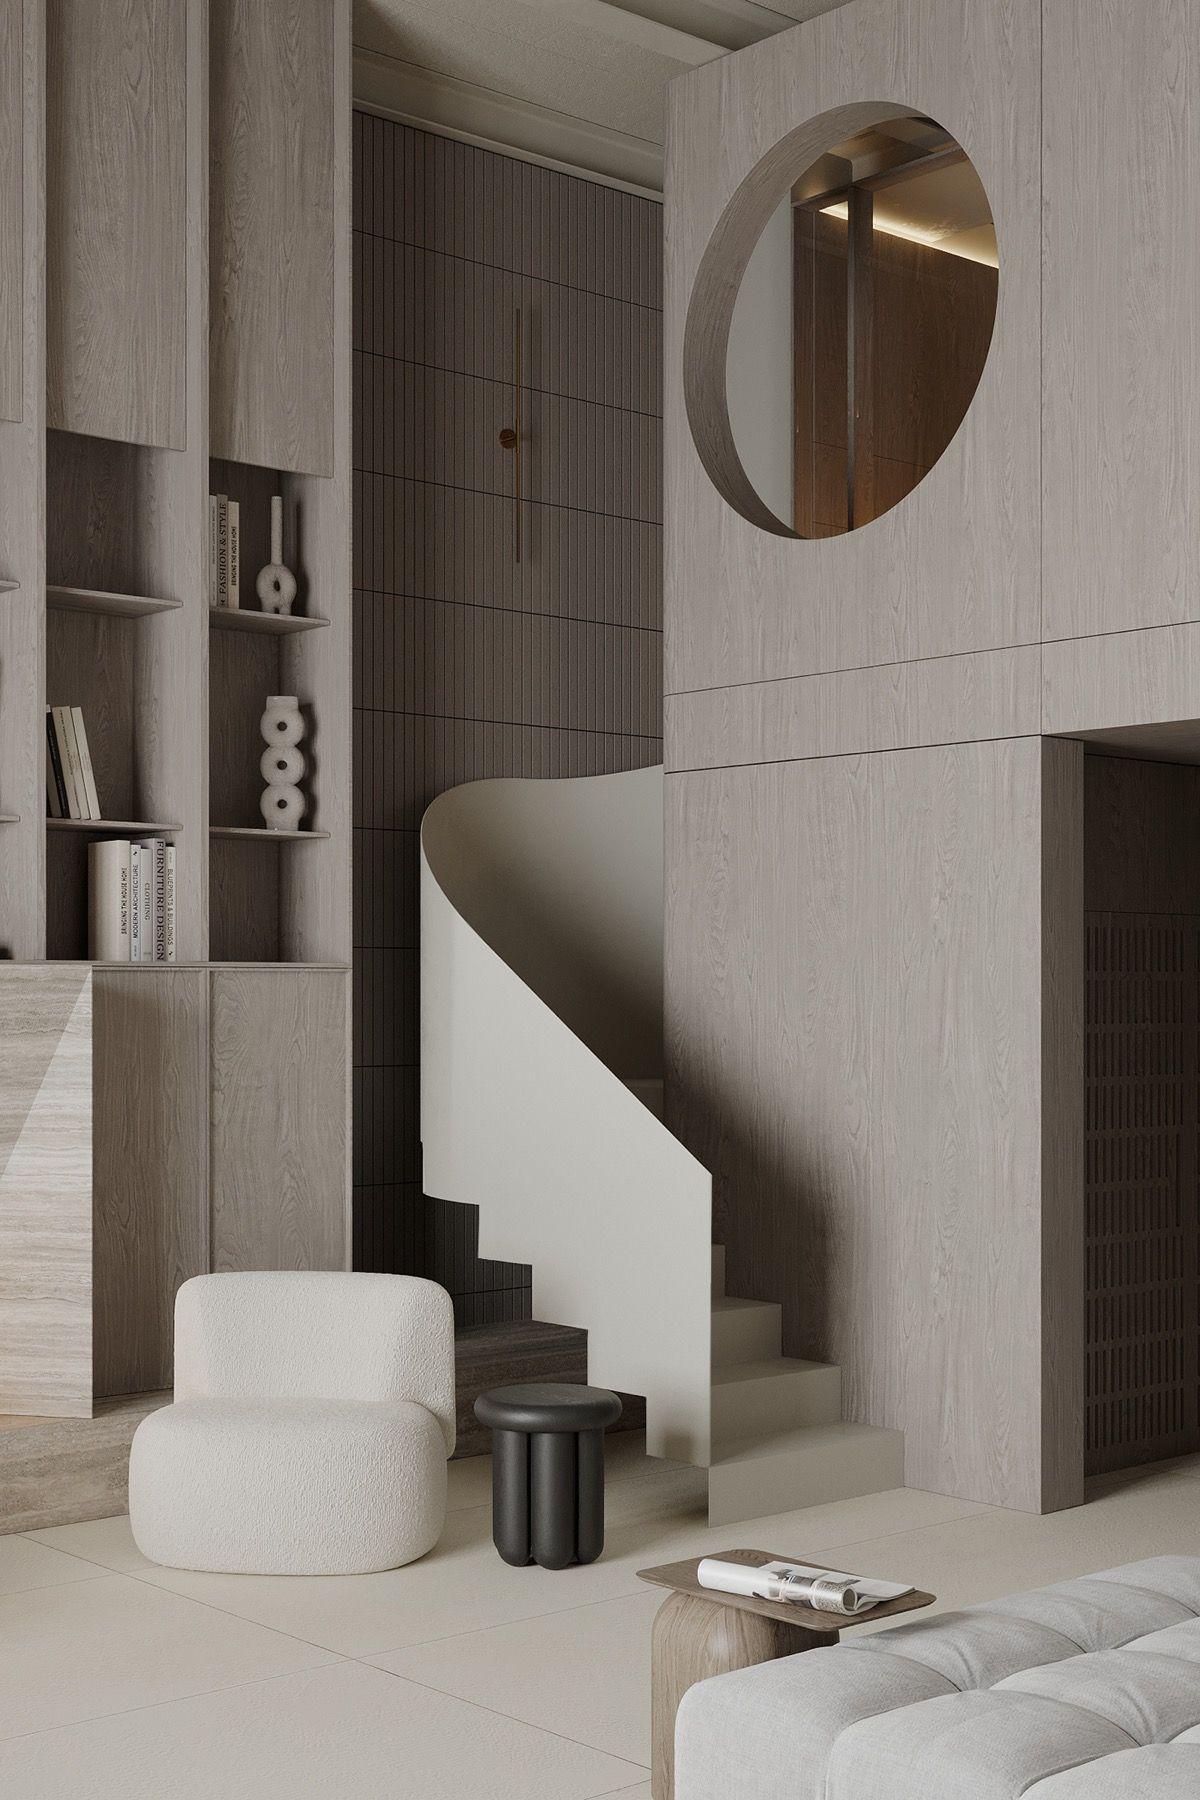 Luxurious Loft Living & Reposeful Decor